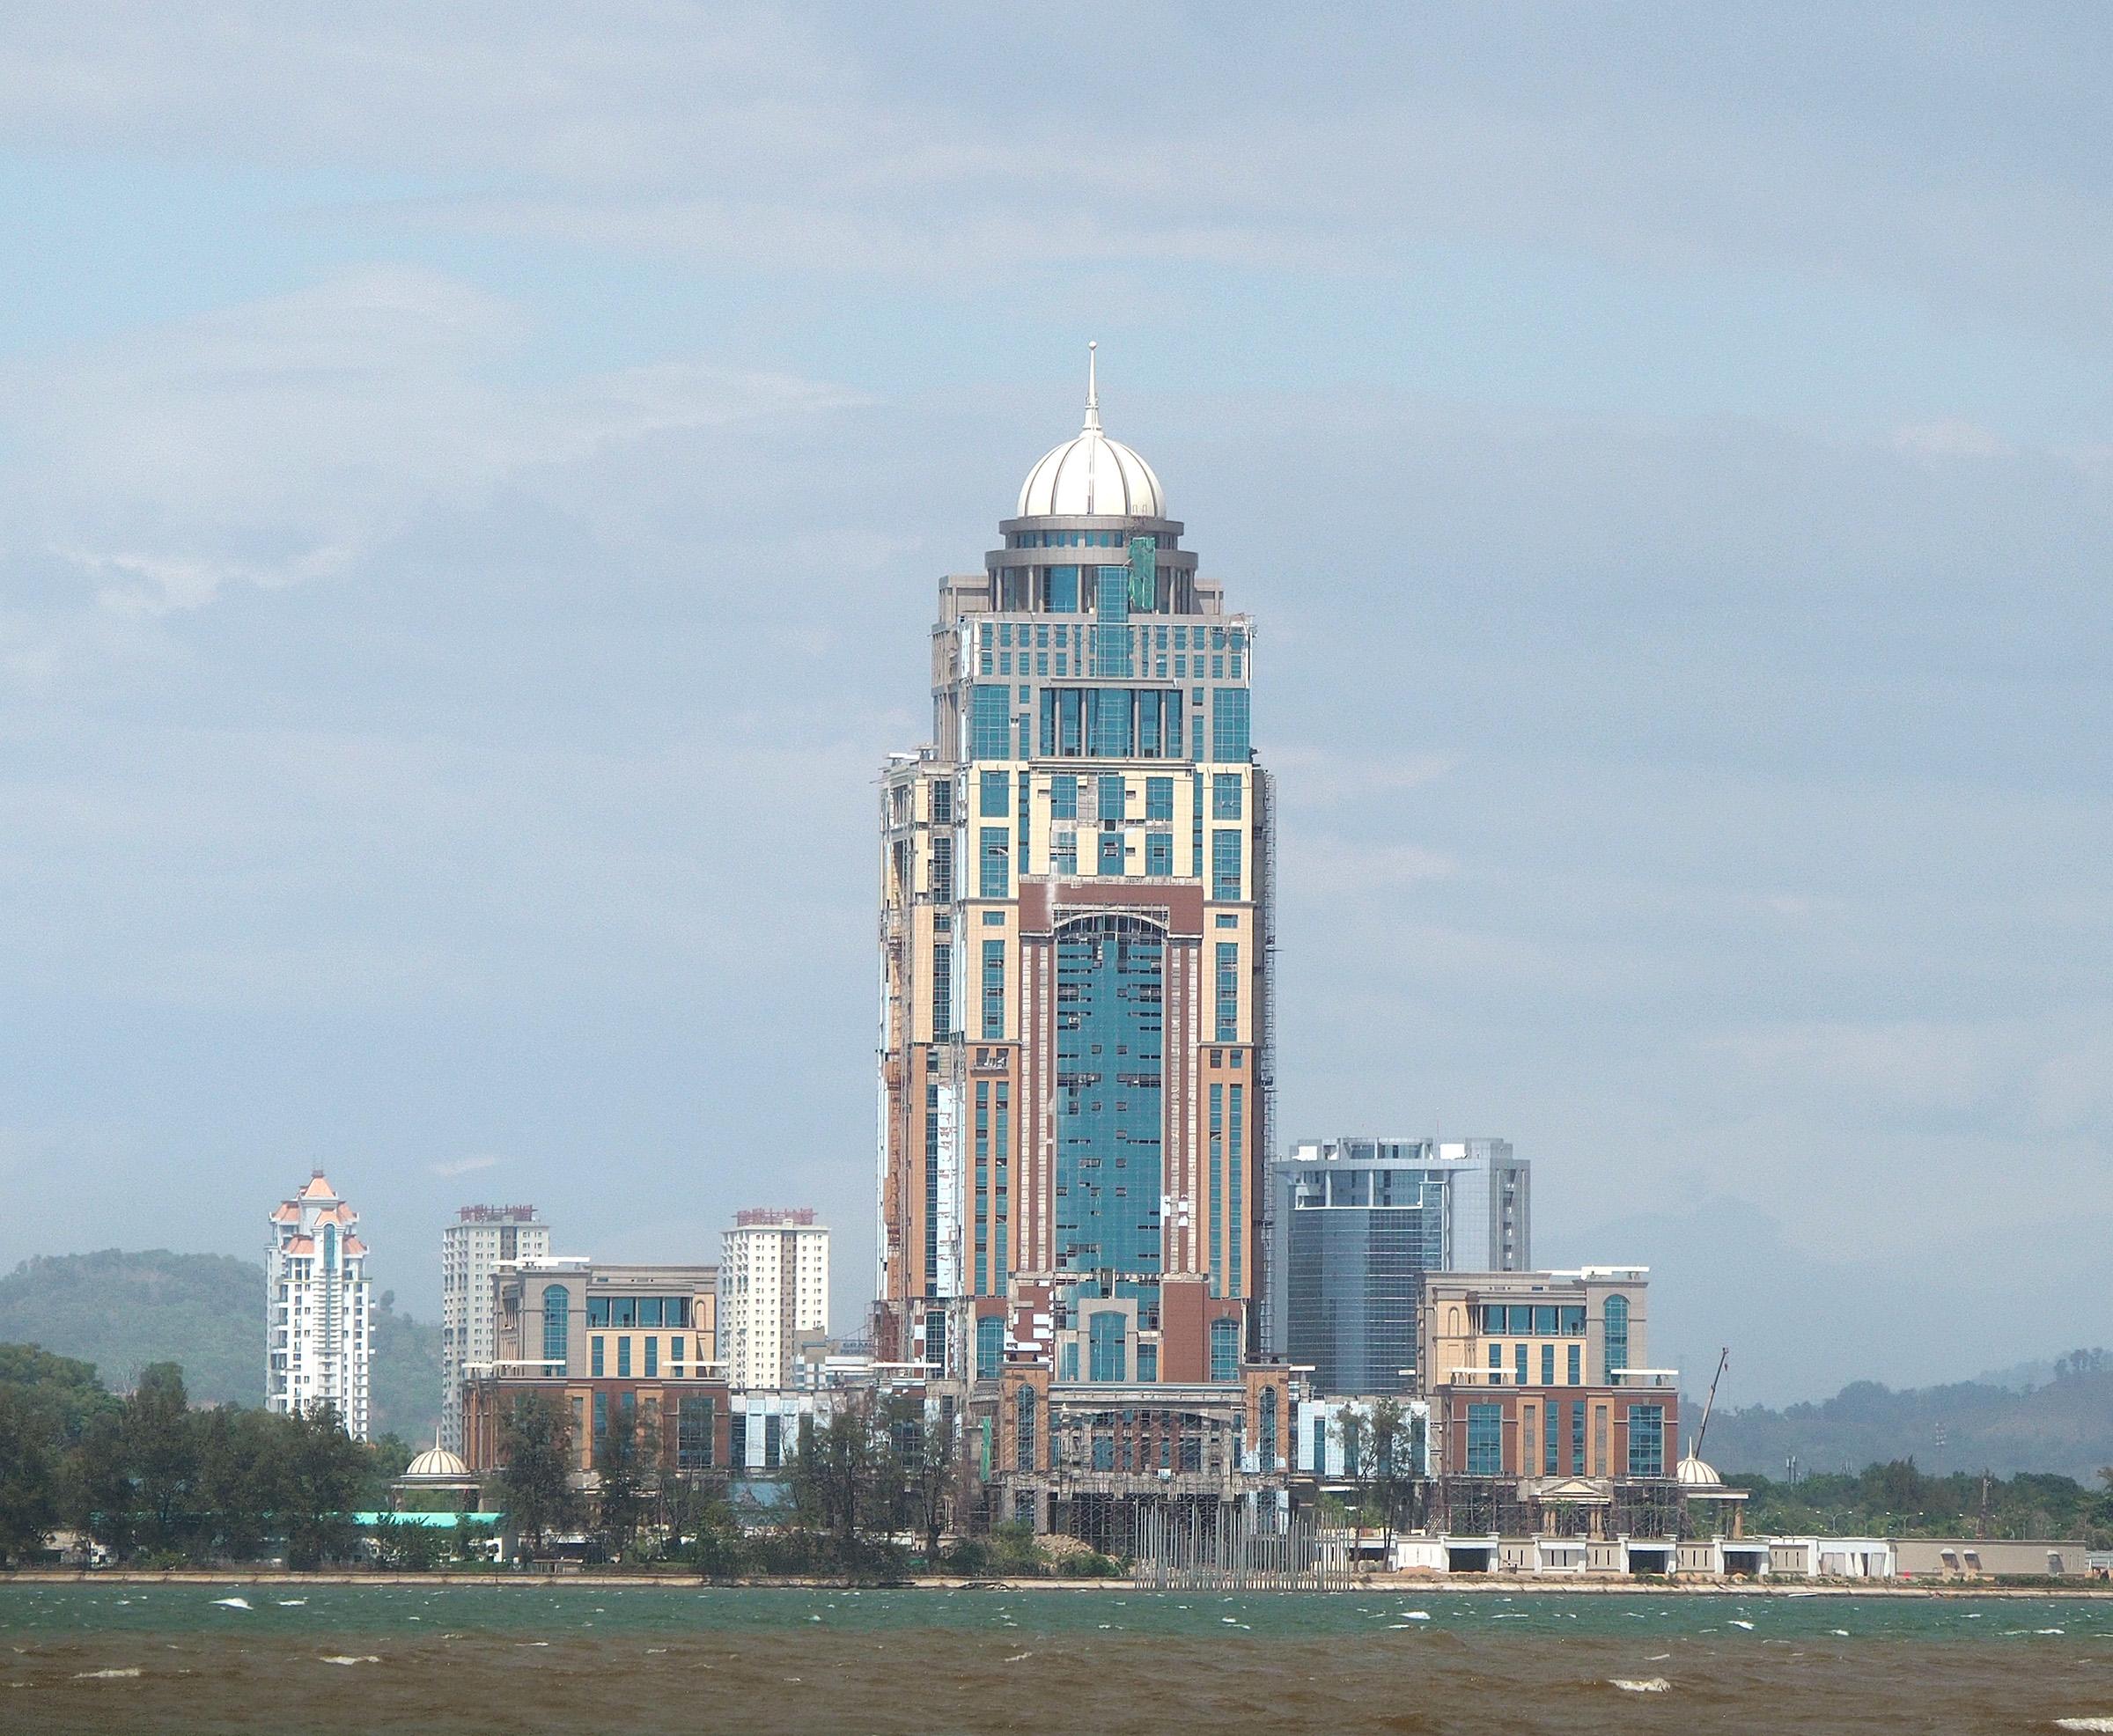 Pusat Pentadbiran Negeri Sabah Wikipedia Bahasa Melayu Ensiklopedia Bebas